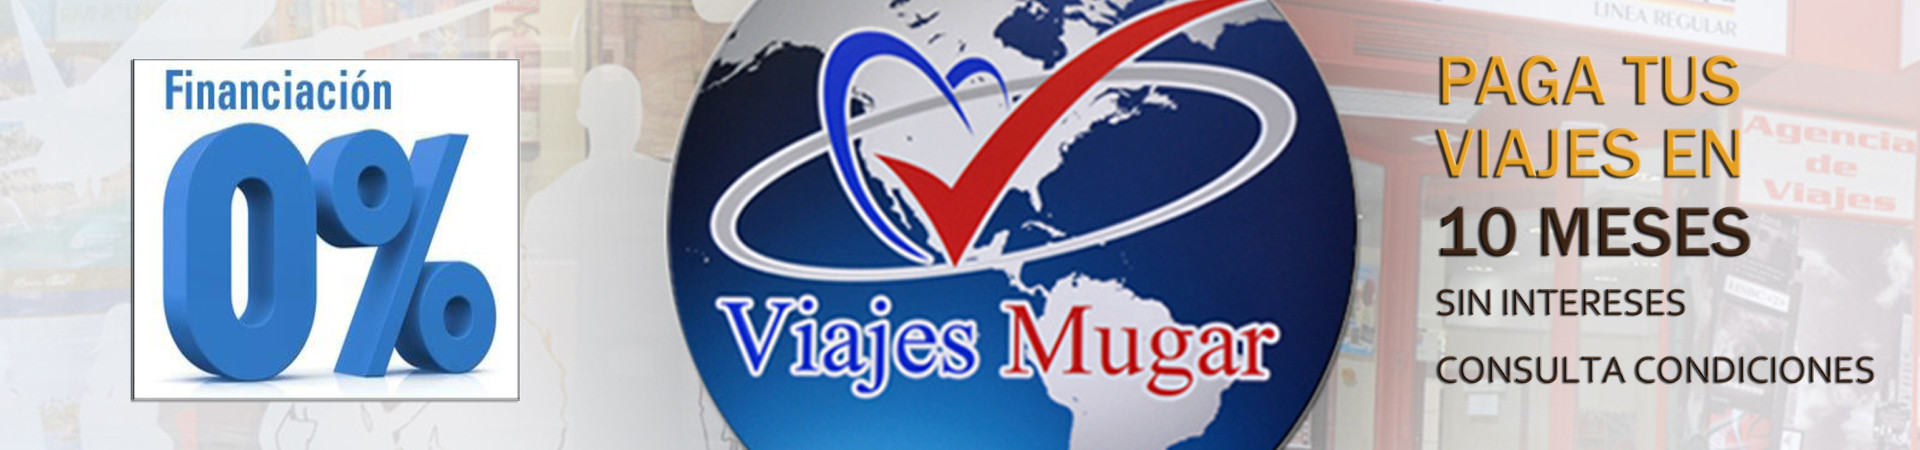 Viajes Mugar